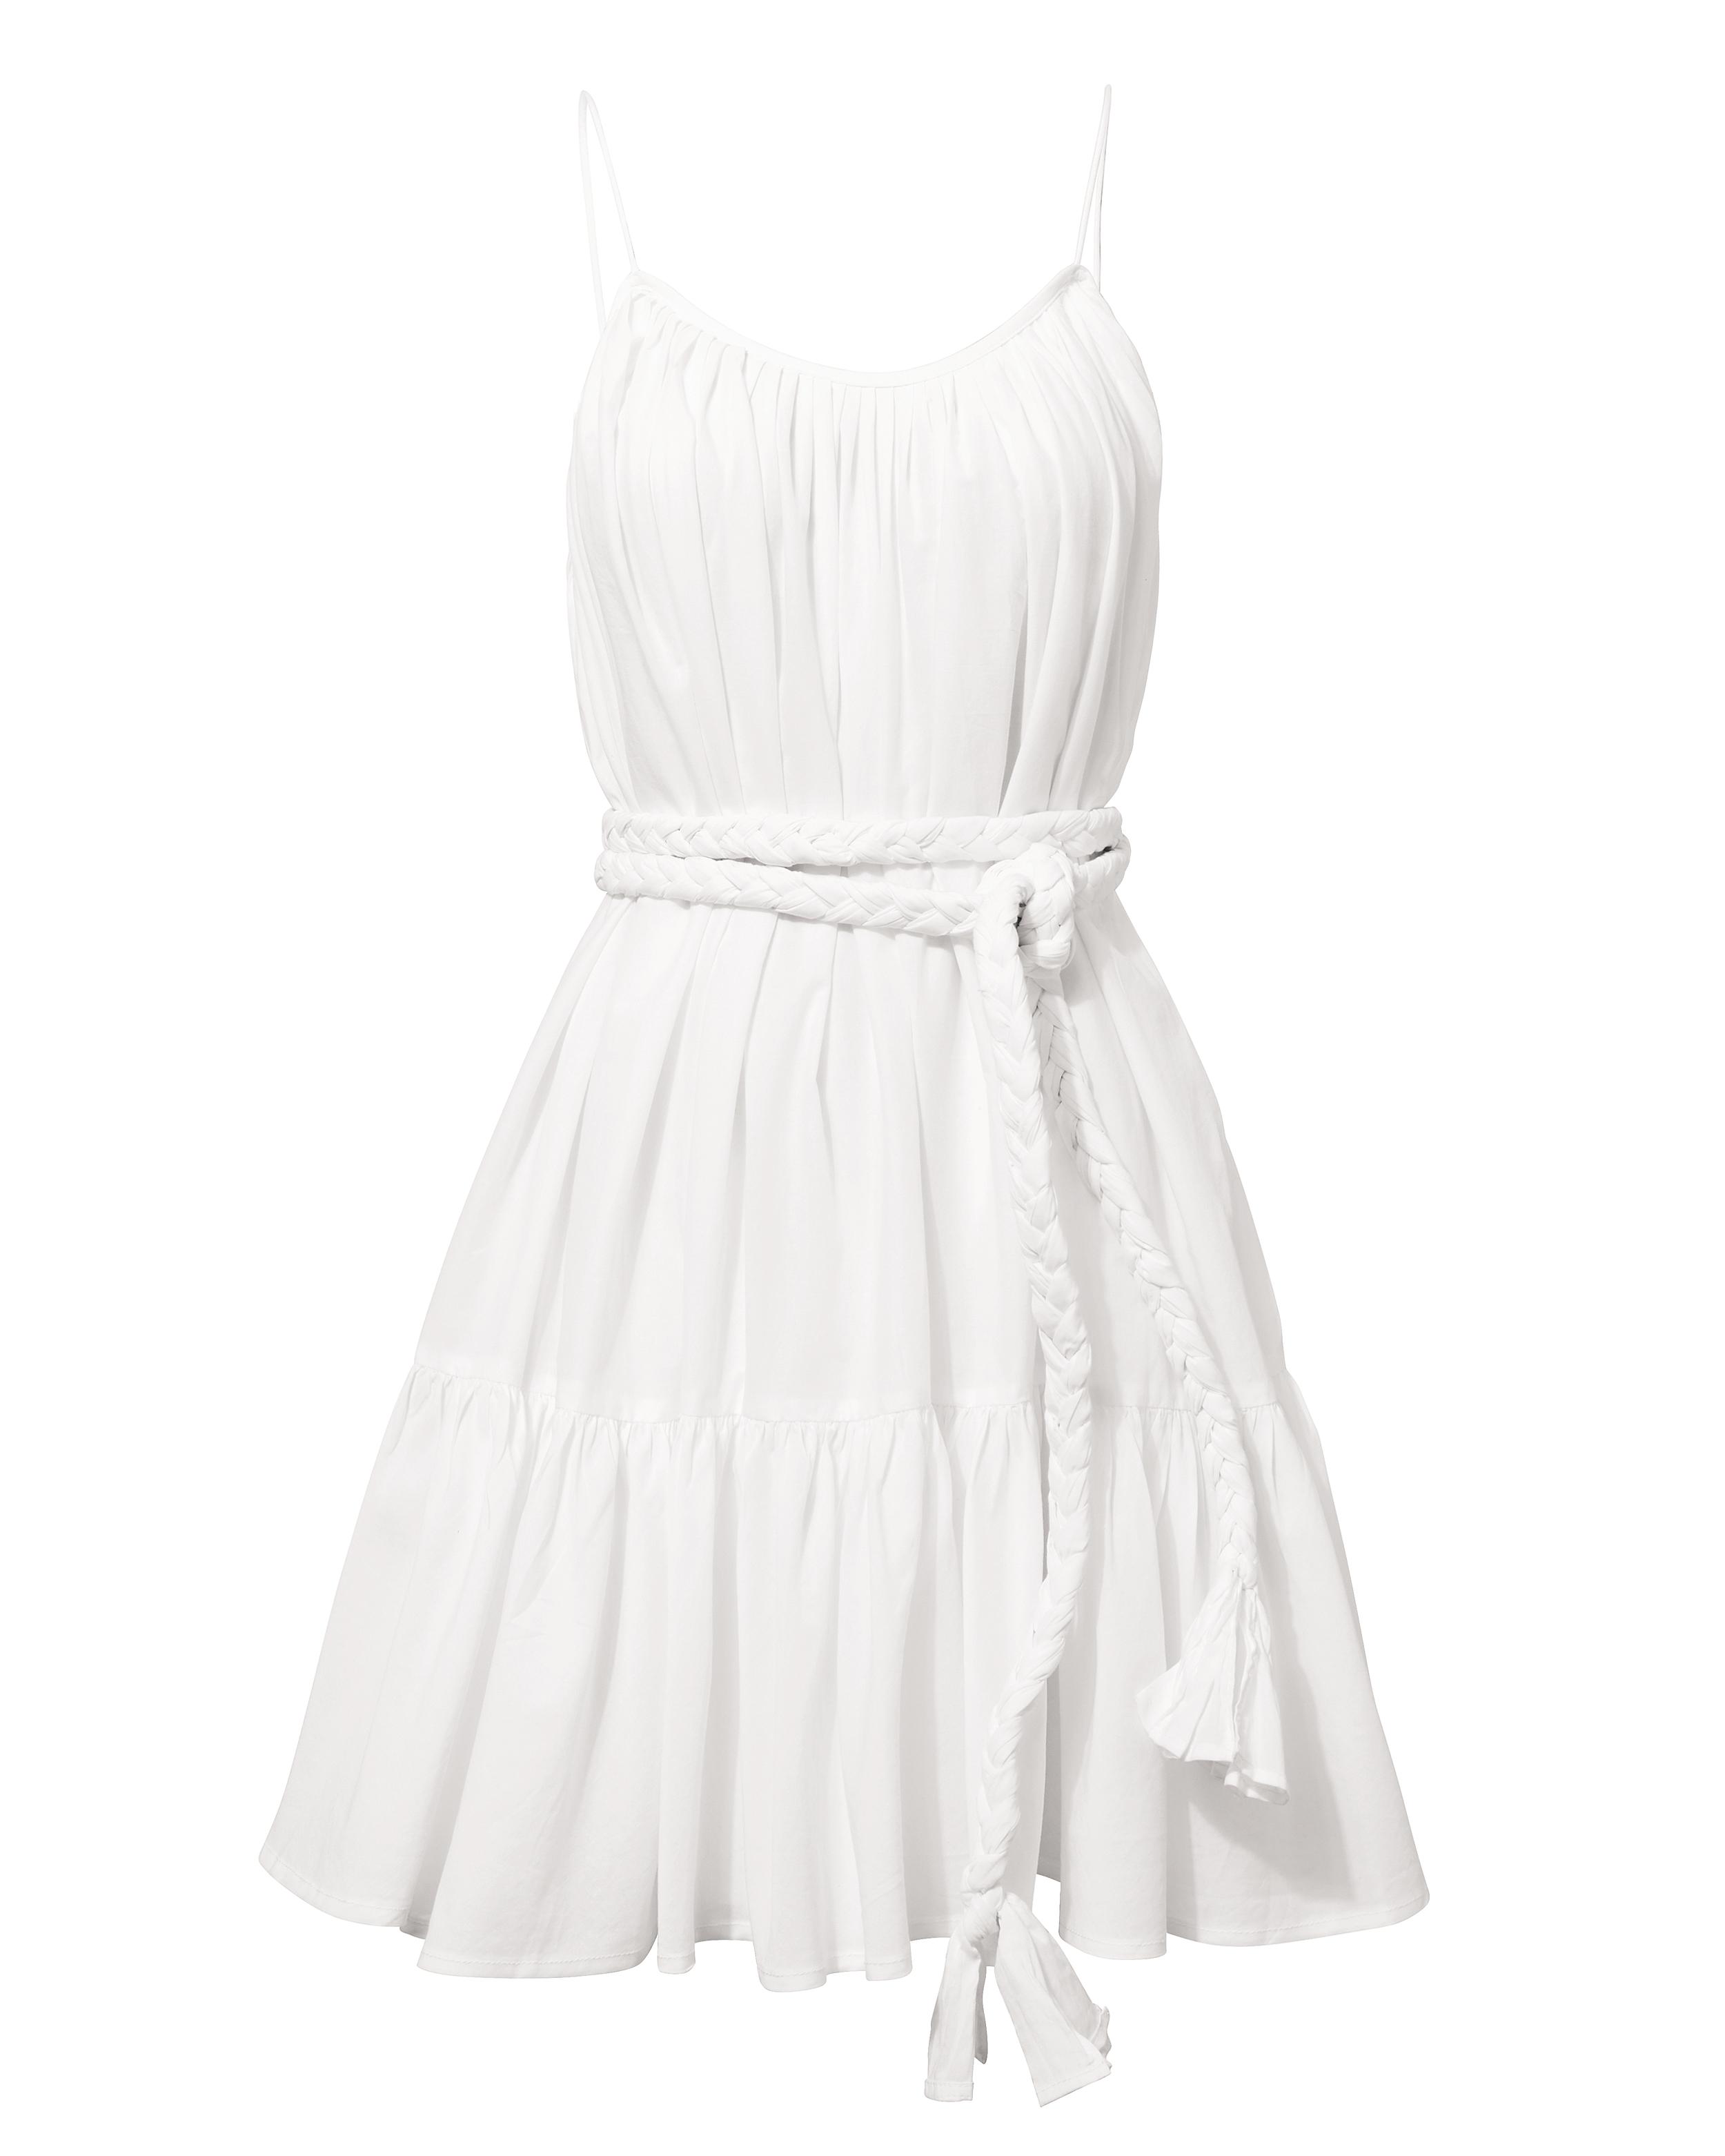 Rhode Nala White Mini Dress